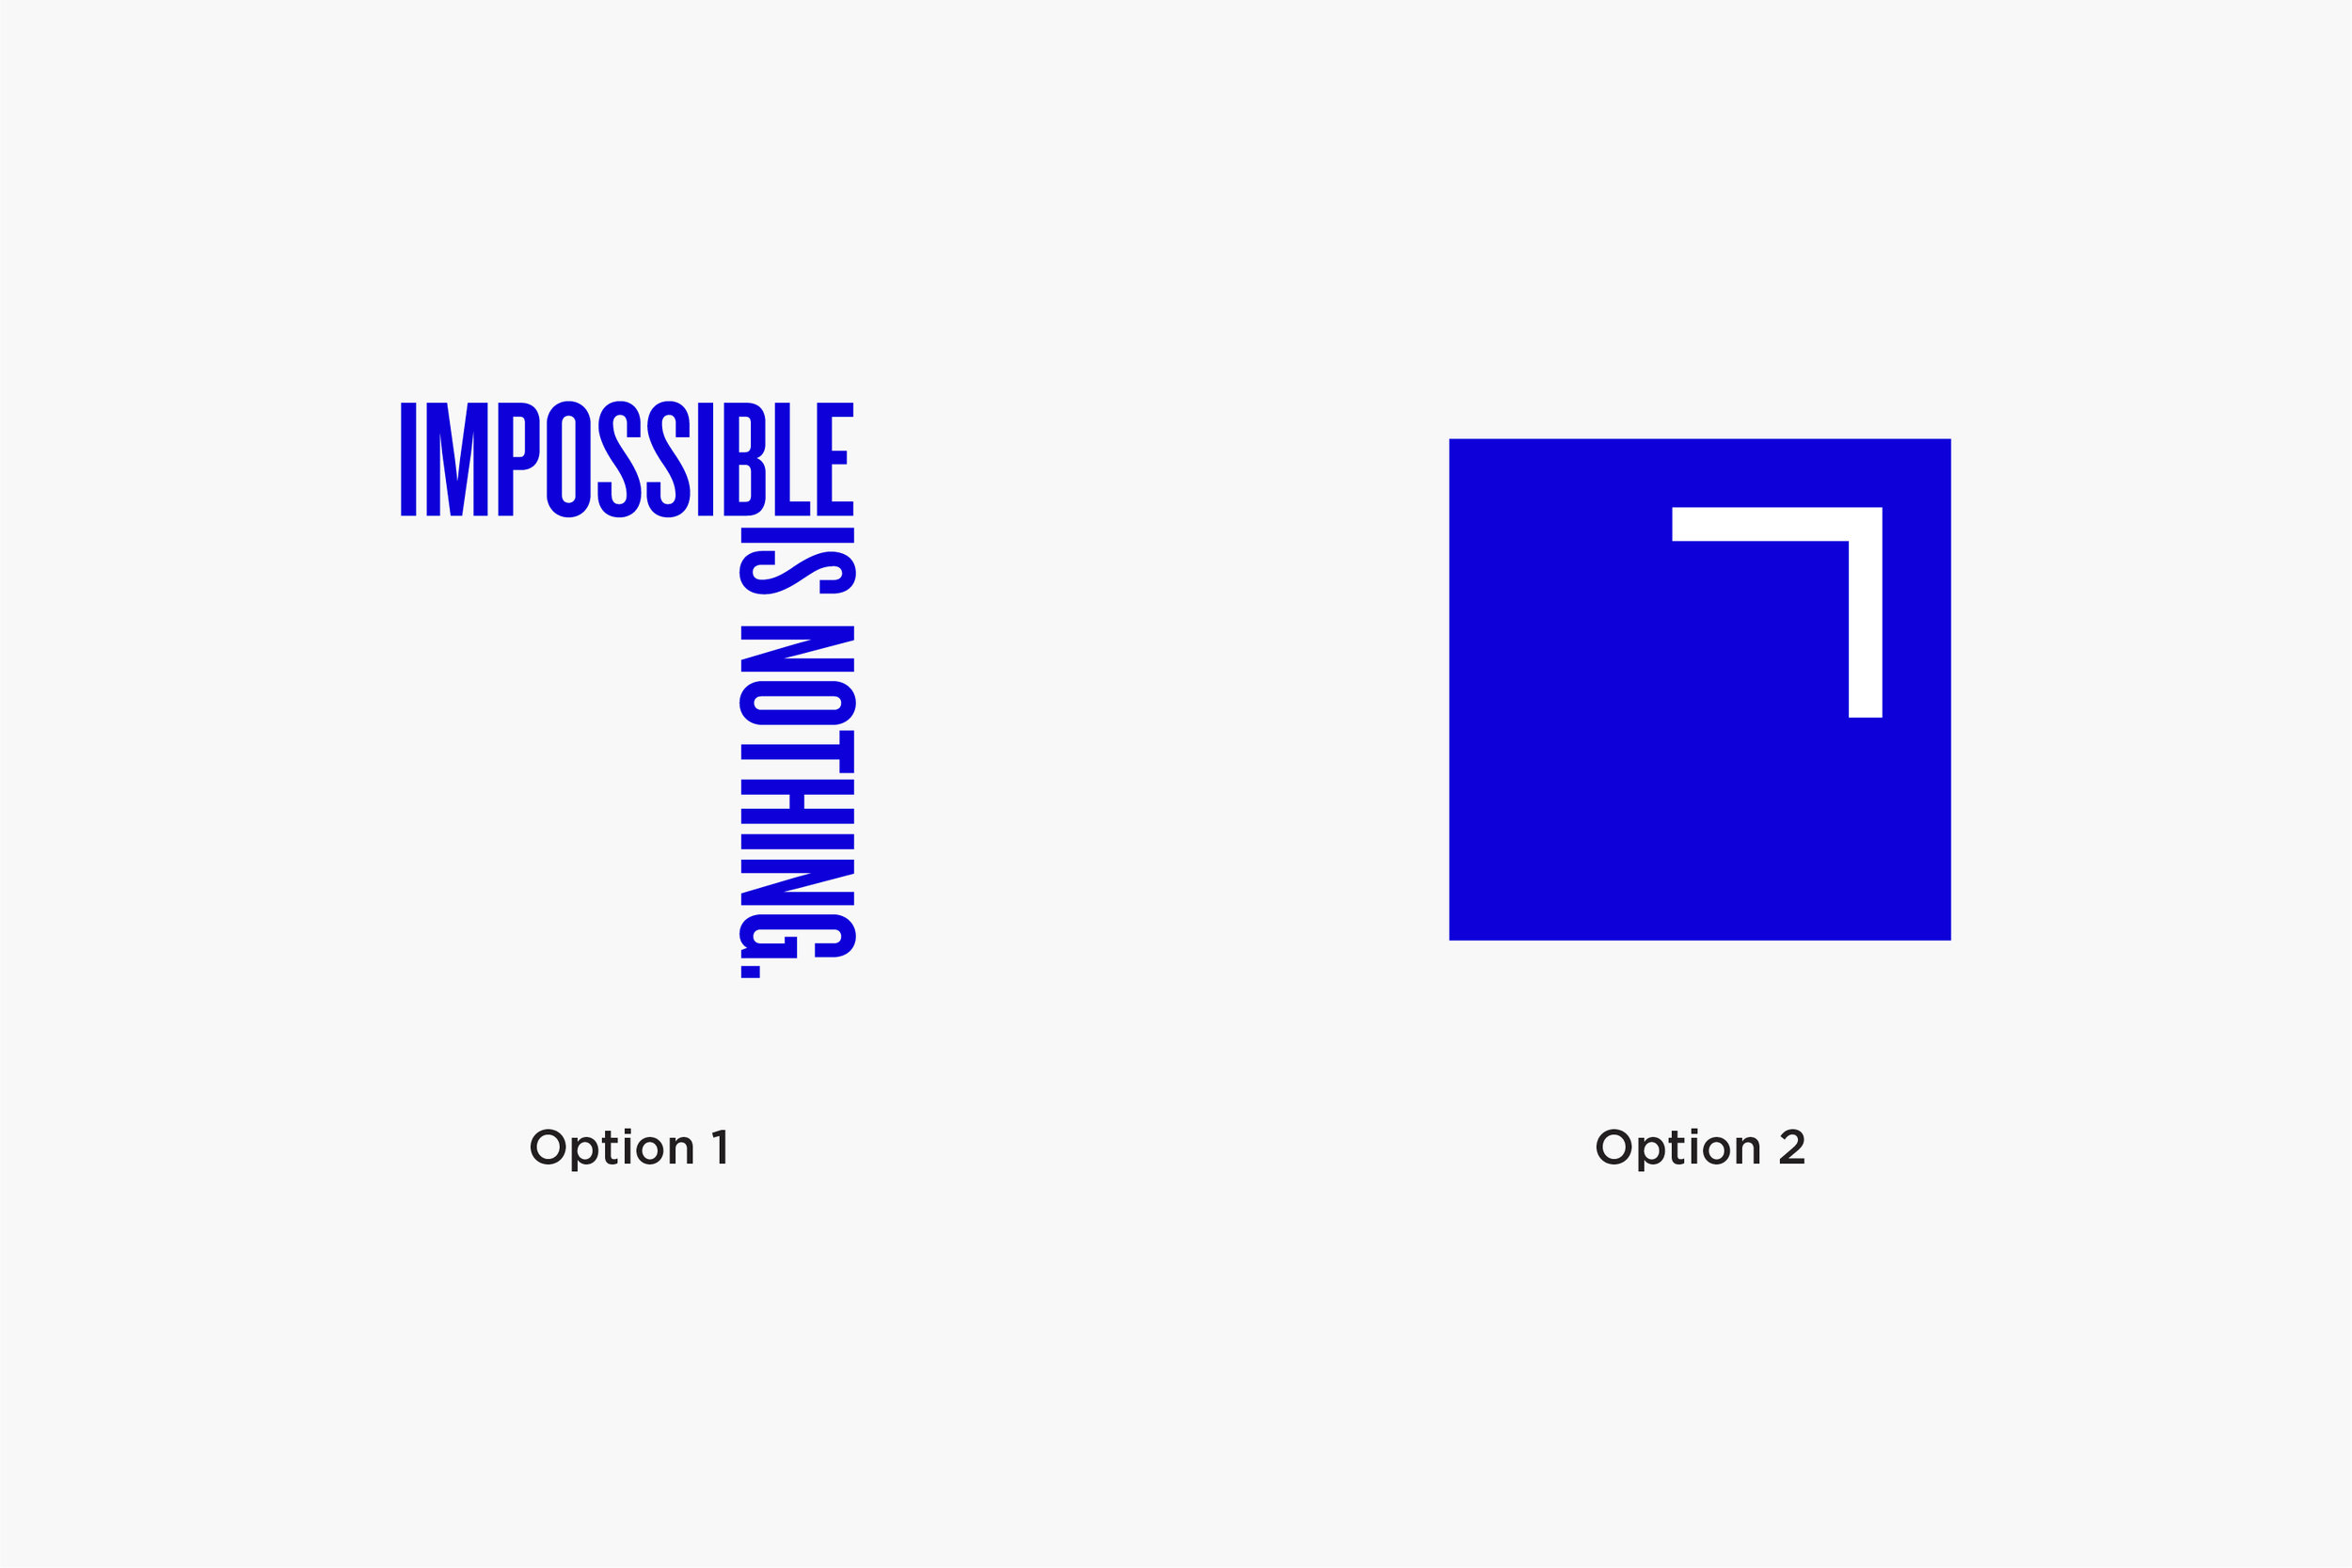 impossibleisnothing2.bg.jpg